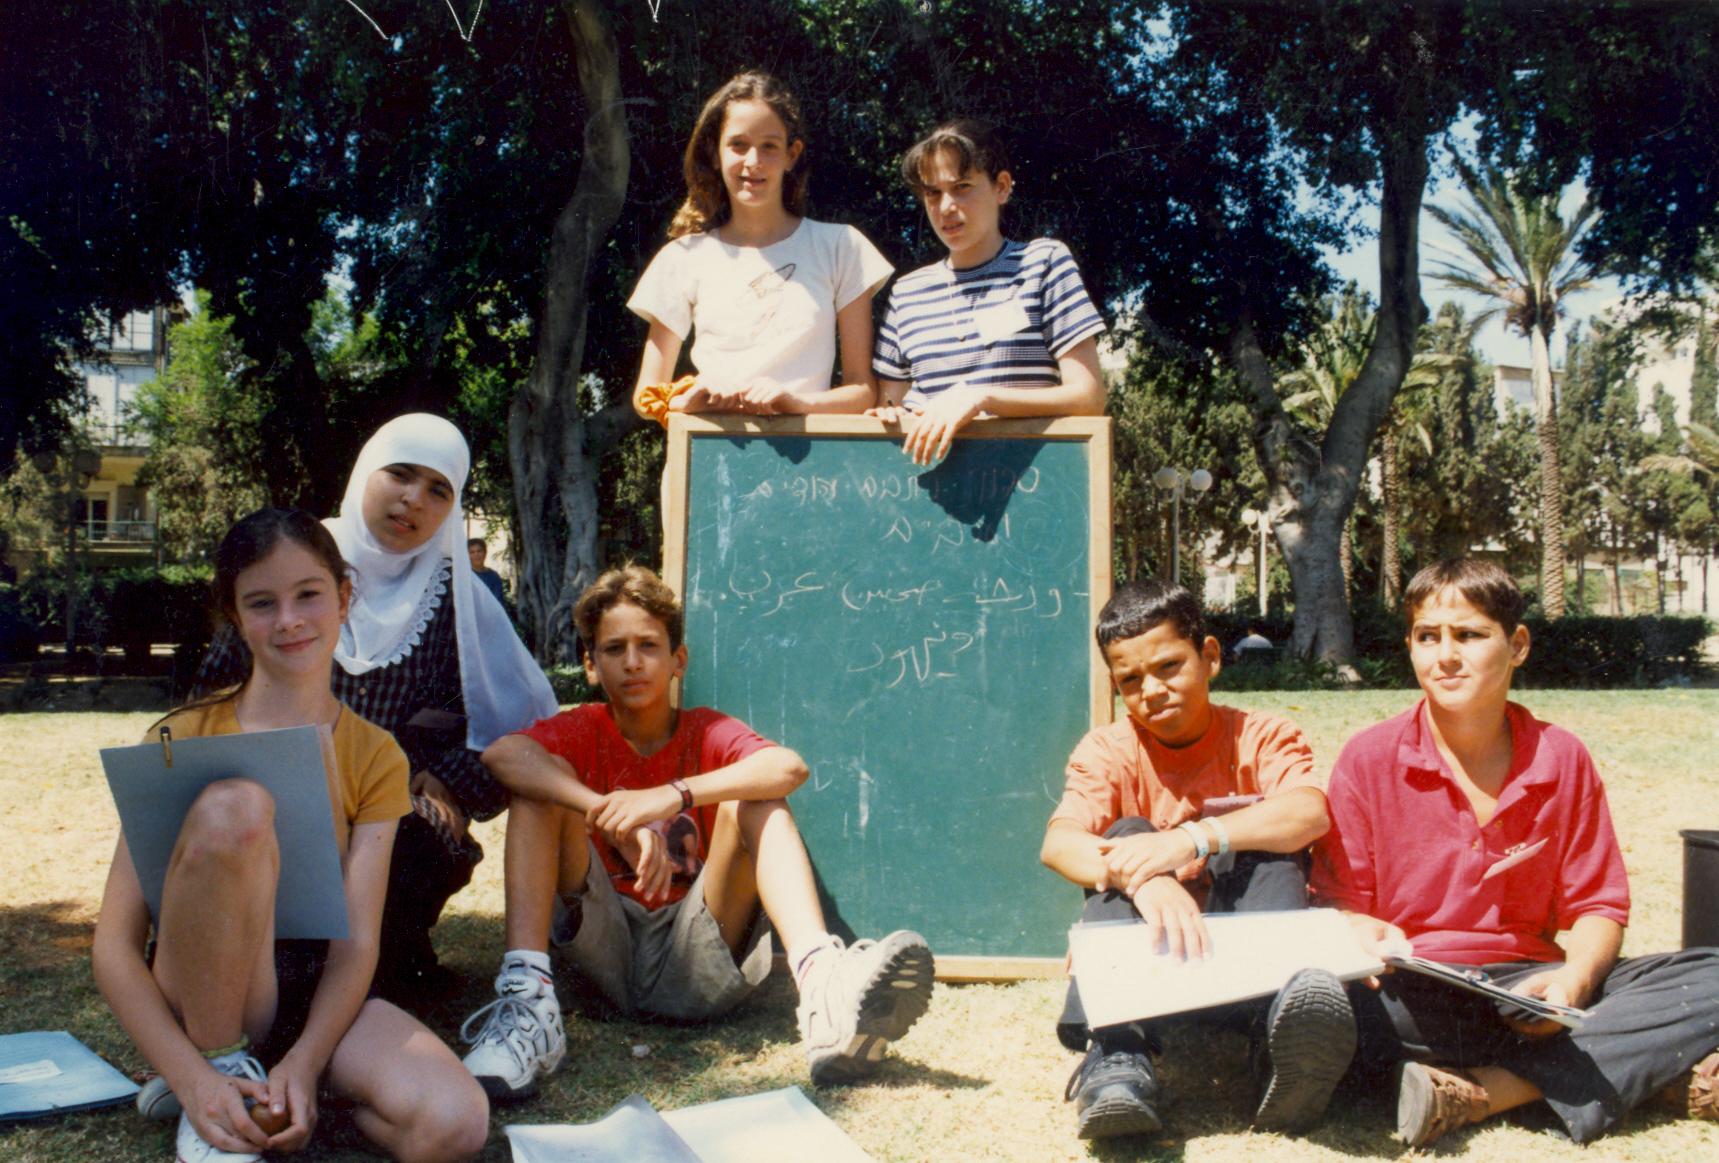 Windows first 4-days journalism seminar. Tel Aviv-Jaffa, summer 1997, with youth from Gaza, Tel Aviv-Jaffa, Kalanswa and more.